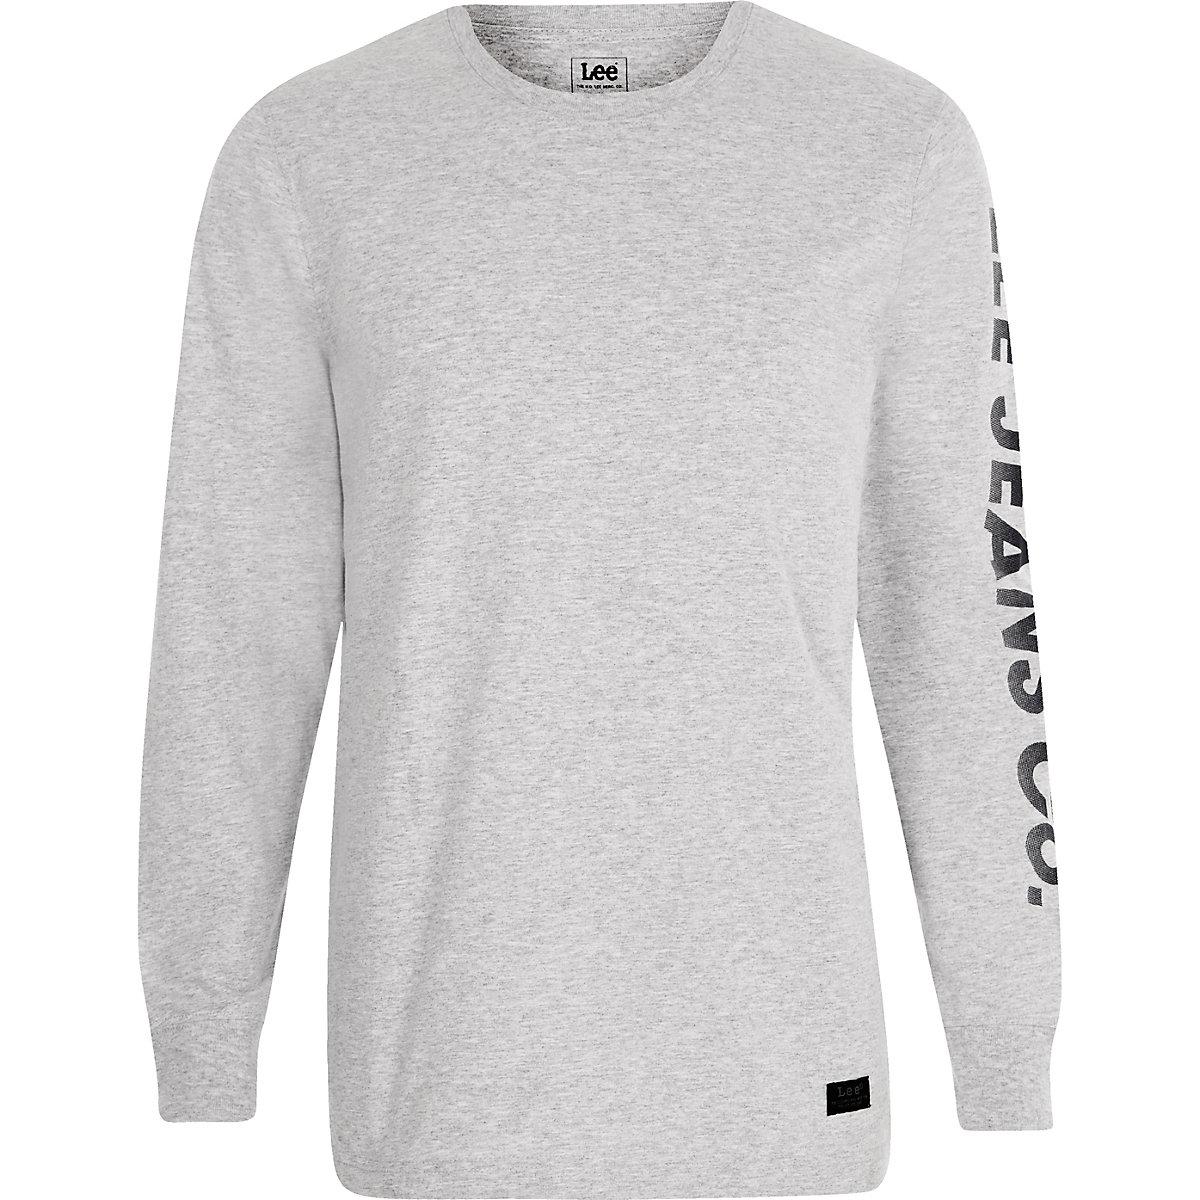 Lee grey logo print long sleeve T-shirt